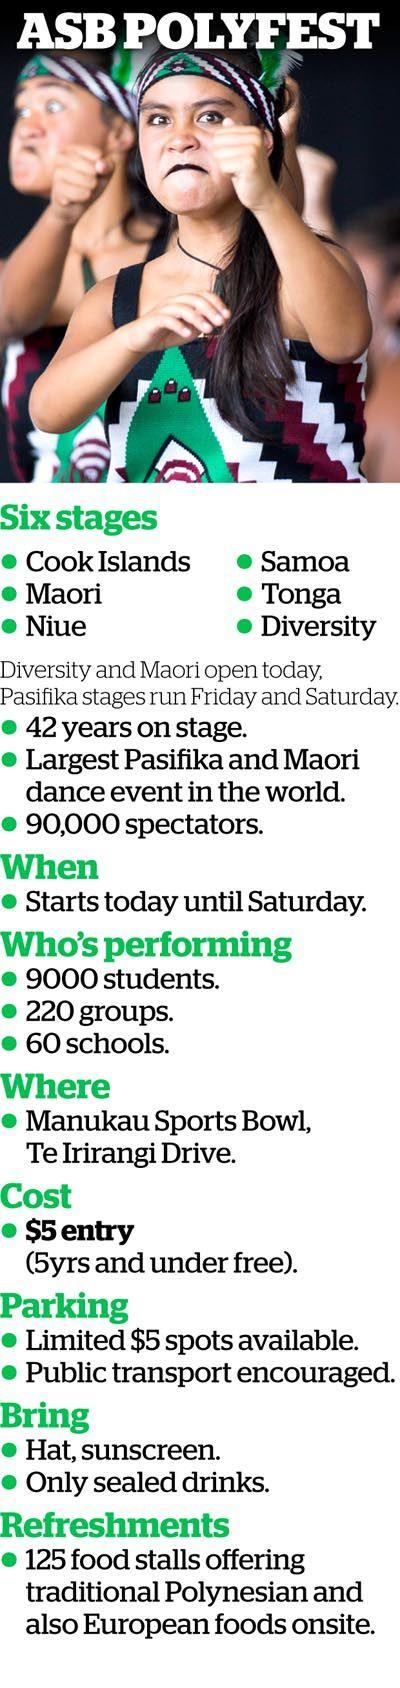 Polyfest 2017: Celebrating culture through leadership - National - NZ Herald News